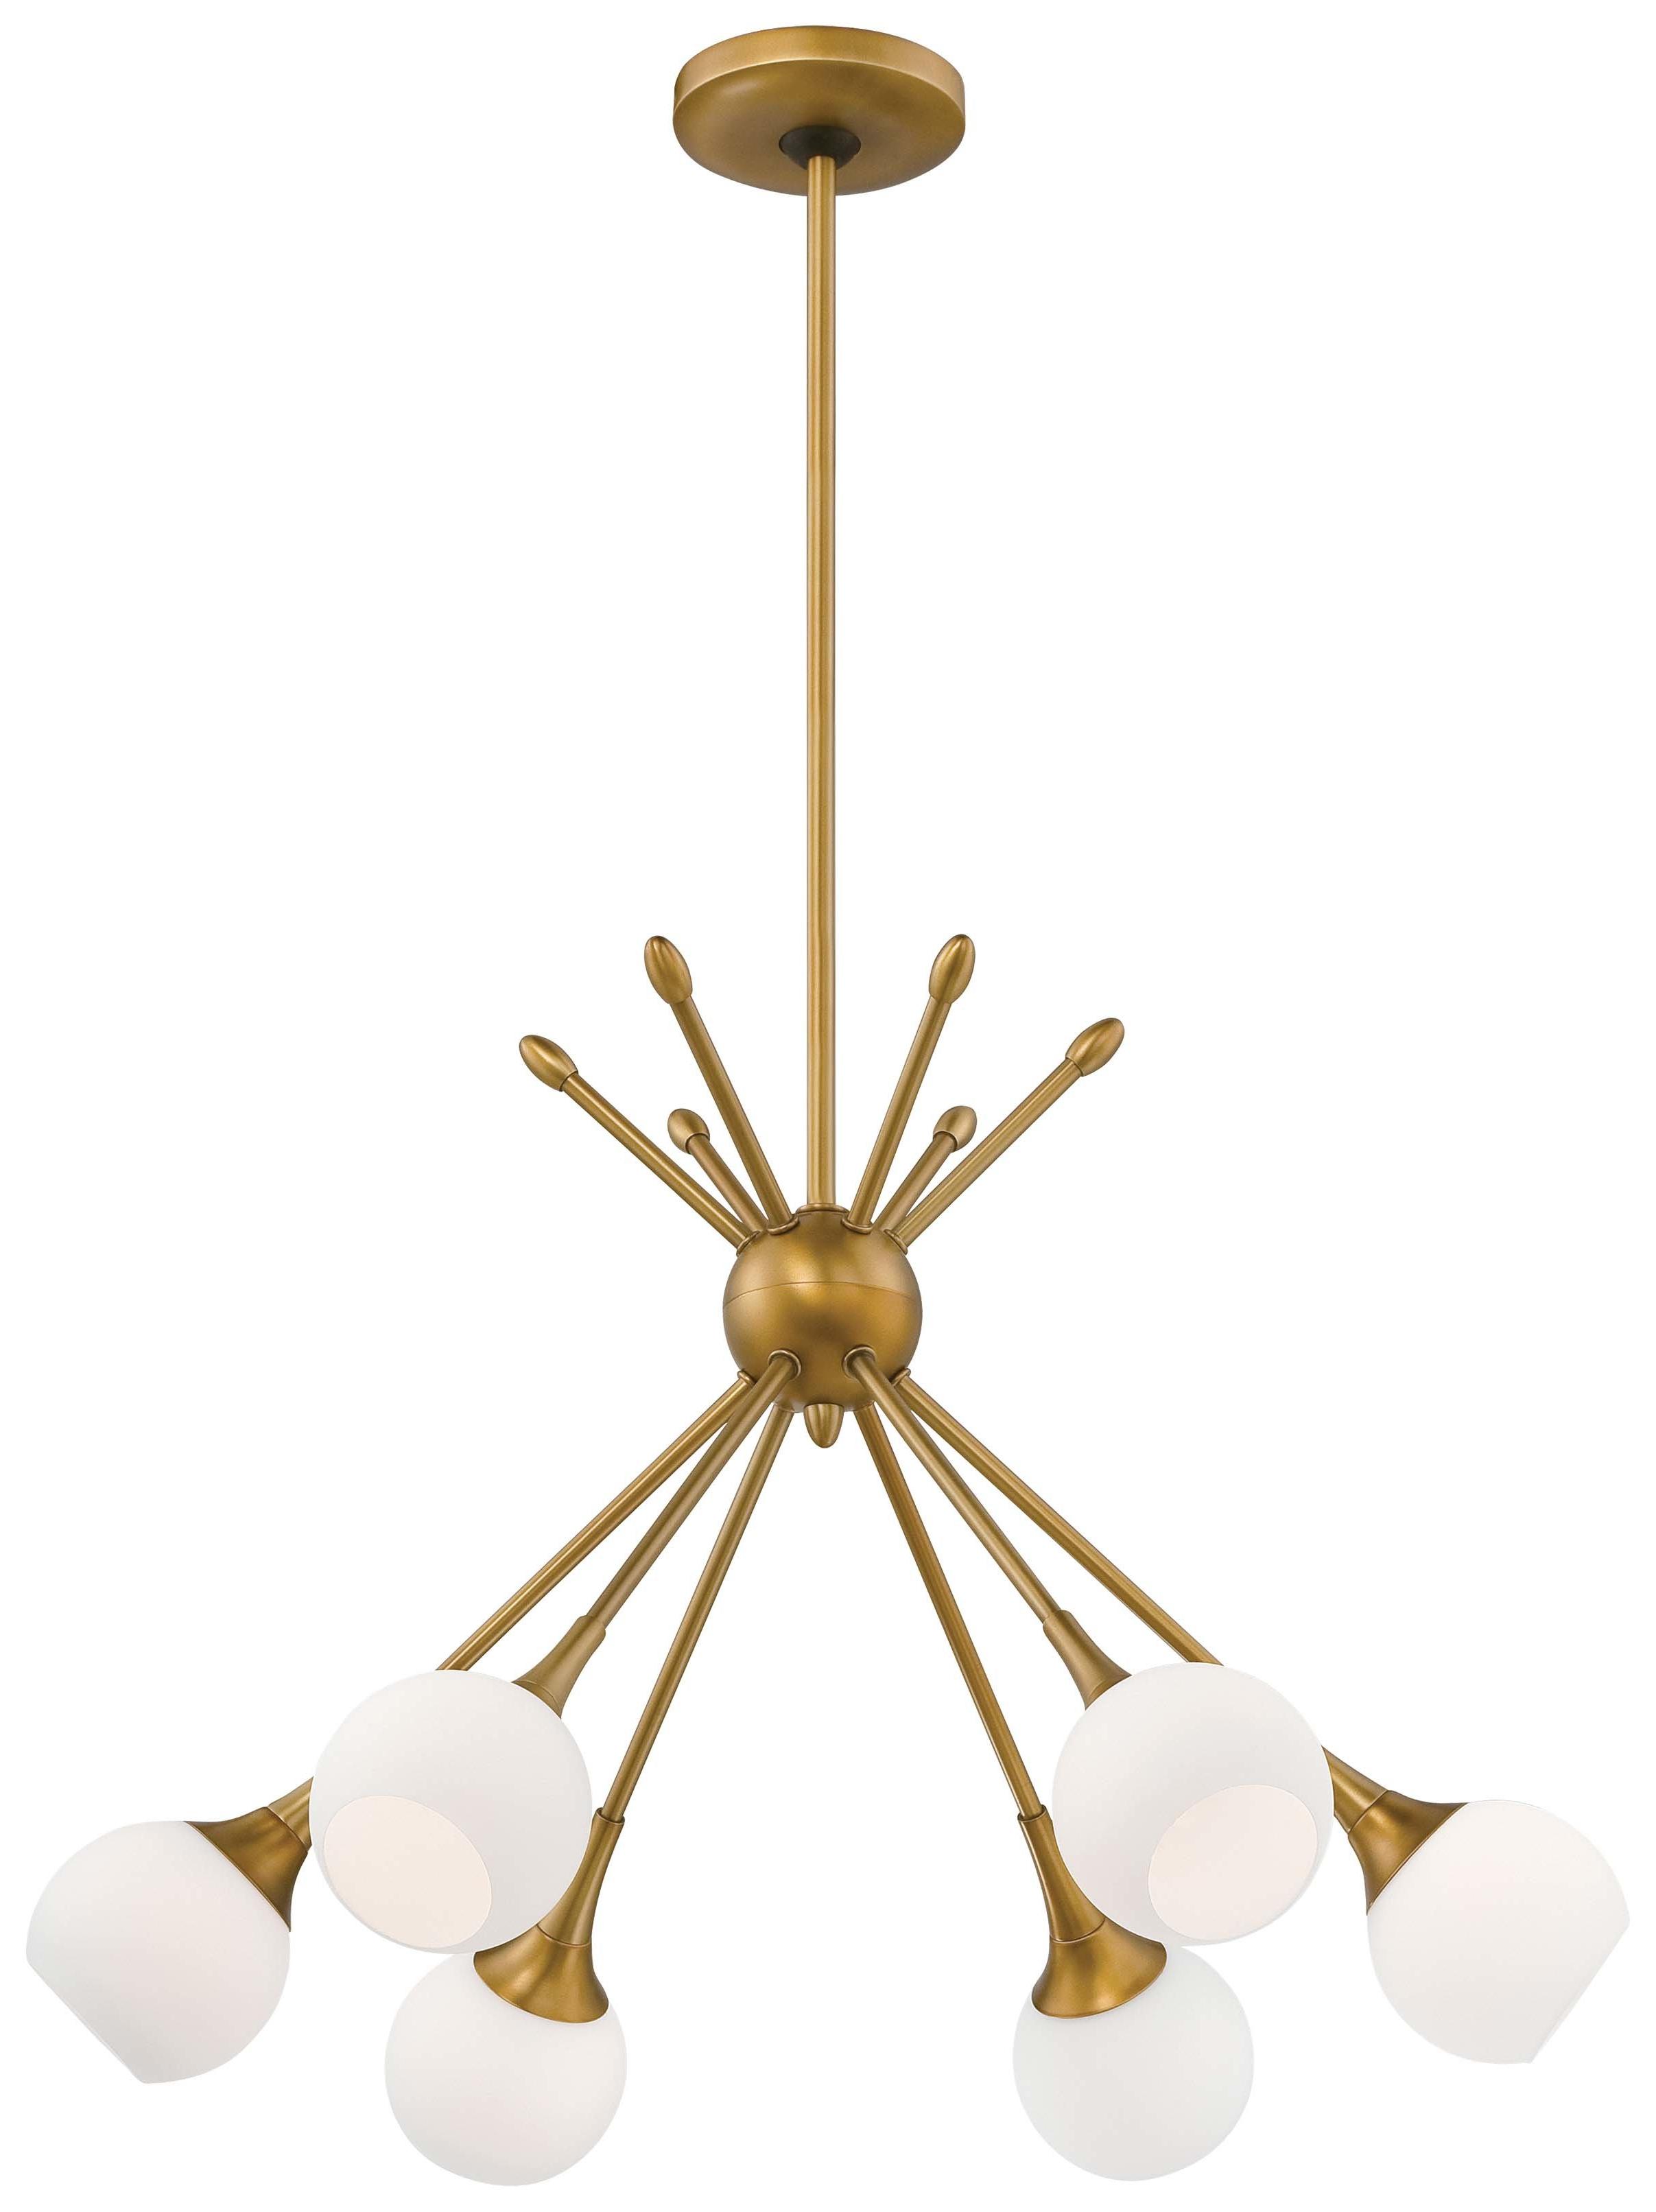 Everett 10 Light Sputnik Chandeliers Throughout Newest Silvia 6 Light Sputnik Chandelier (View 13 of 25)